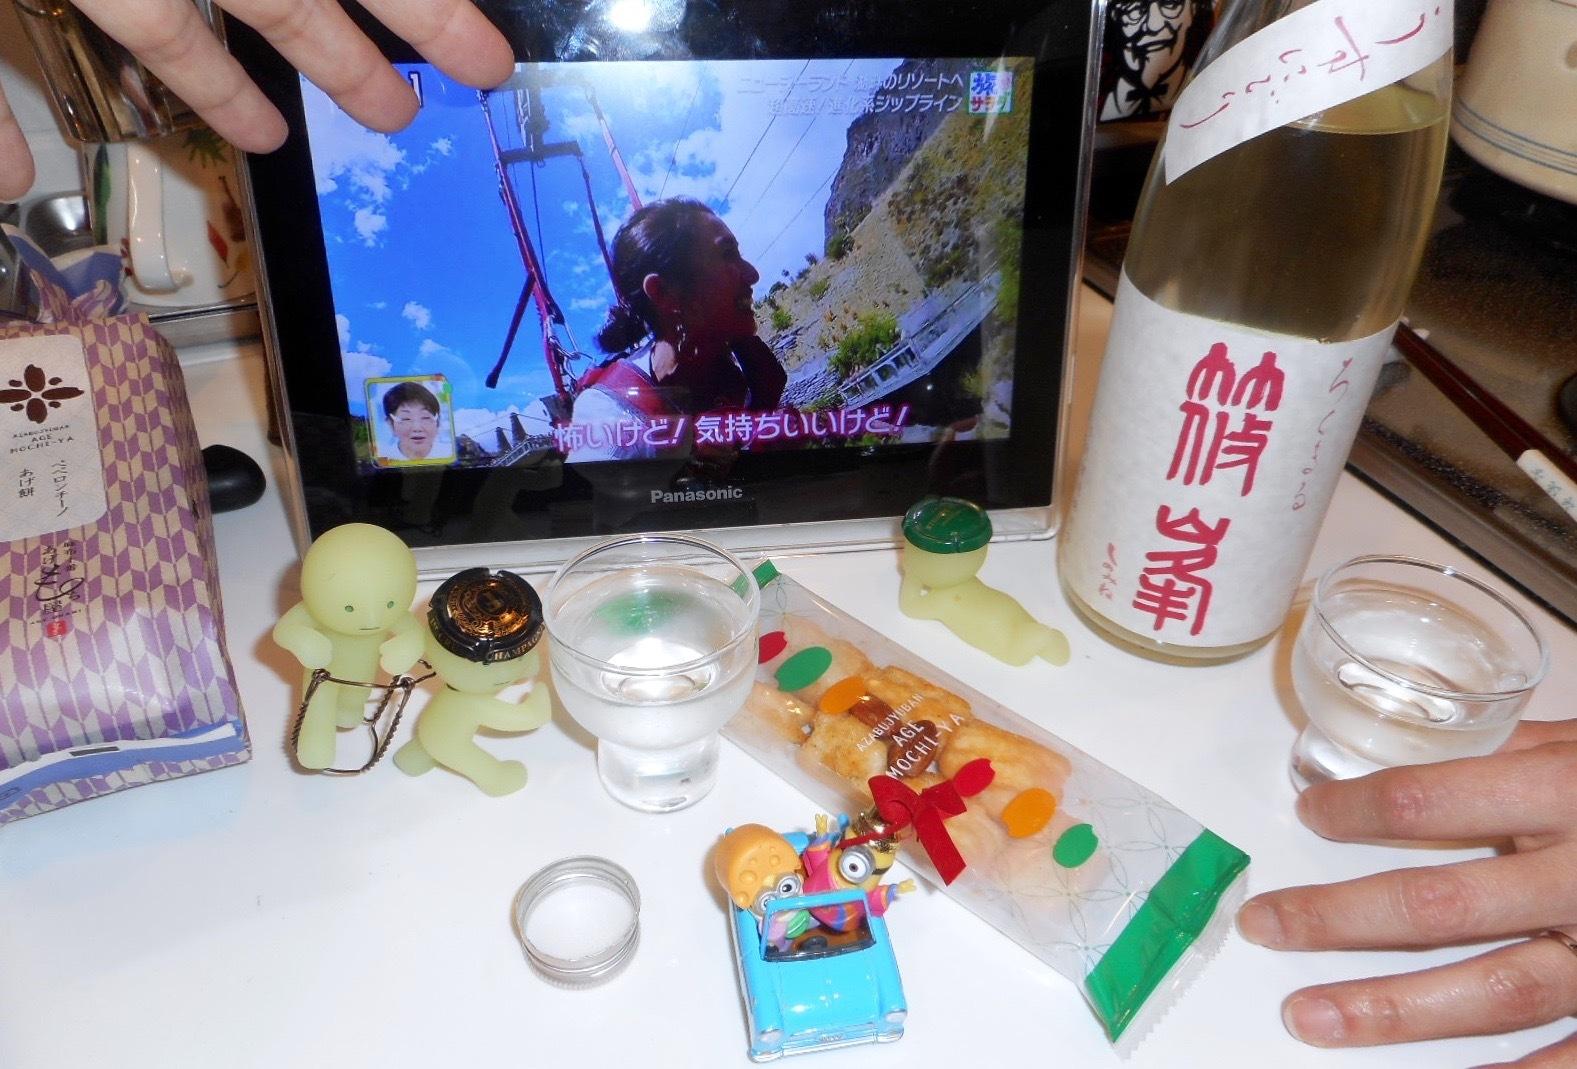 rokumaru_oyama_usunigori29by4.jpg